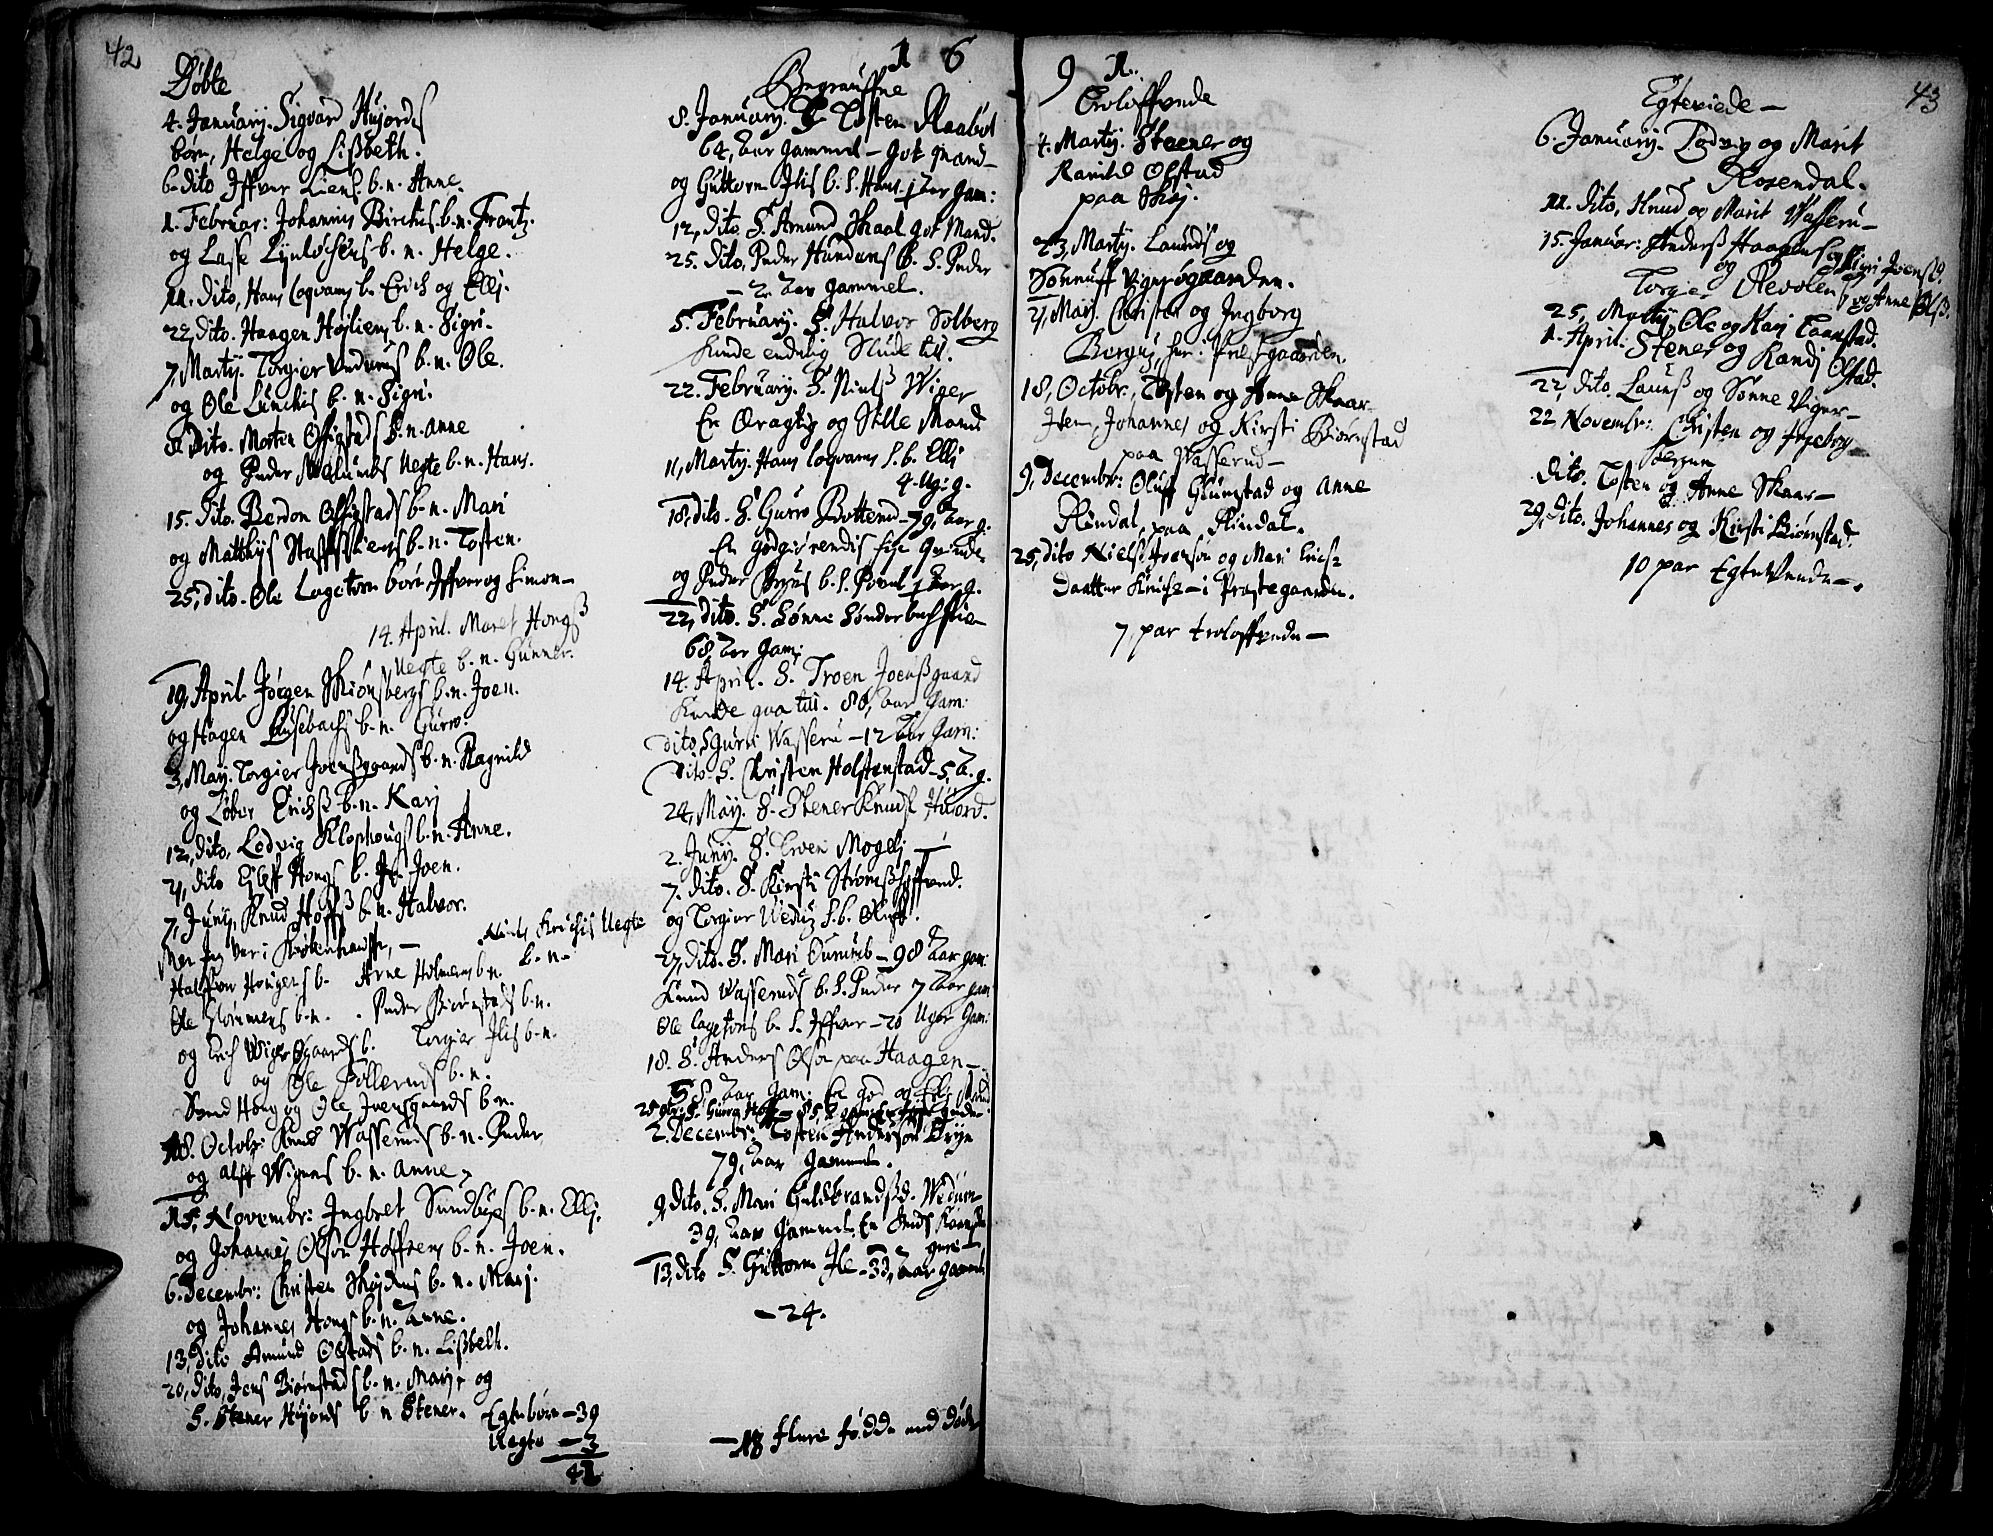 SAH, Øyer prestekontor, Ministerialbok nr. 1, 1671-1727, s. 42-43